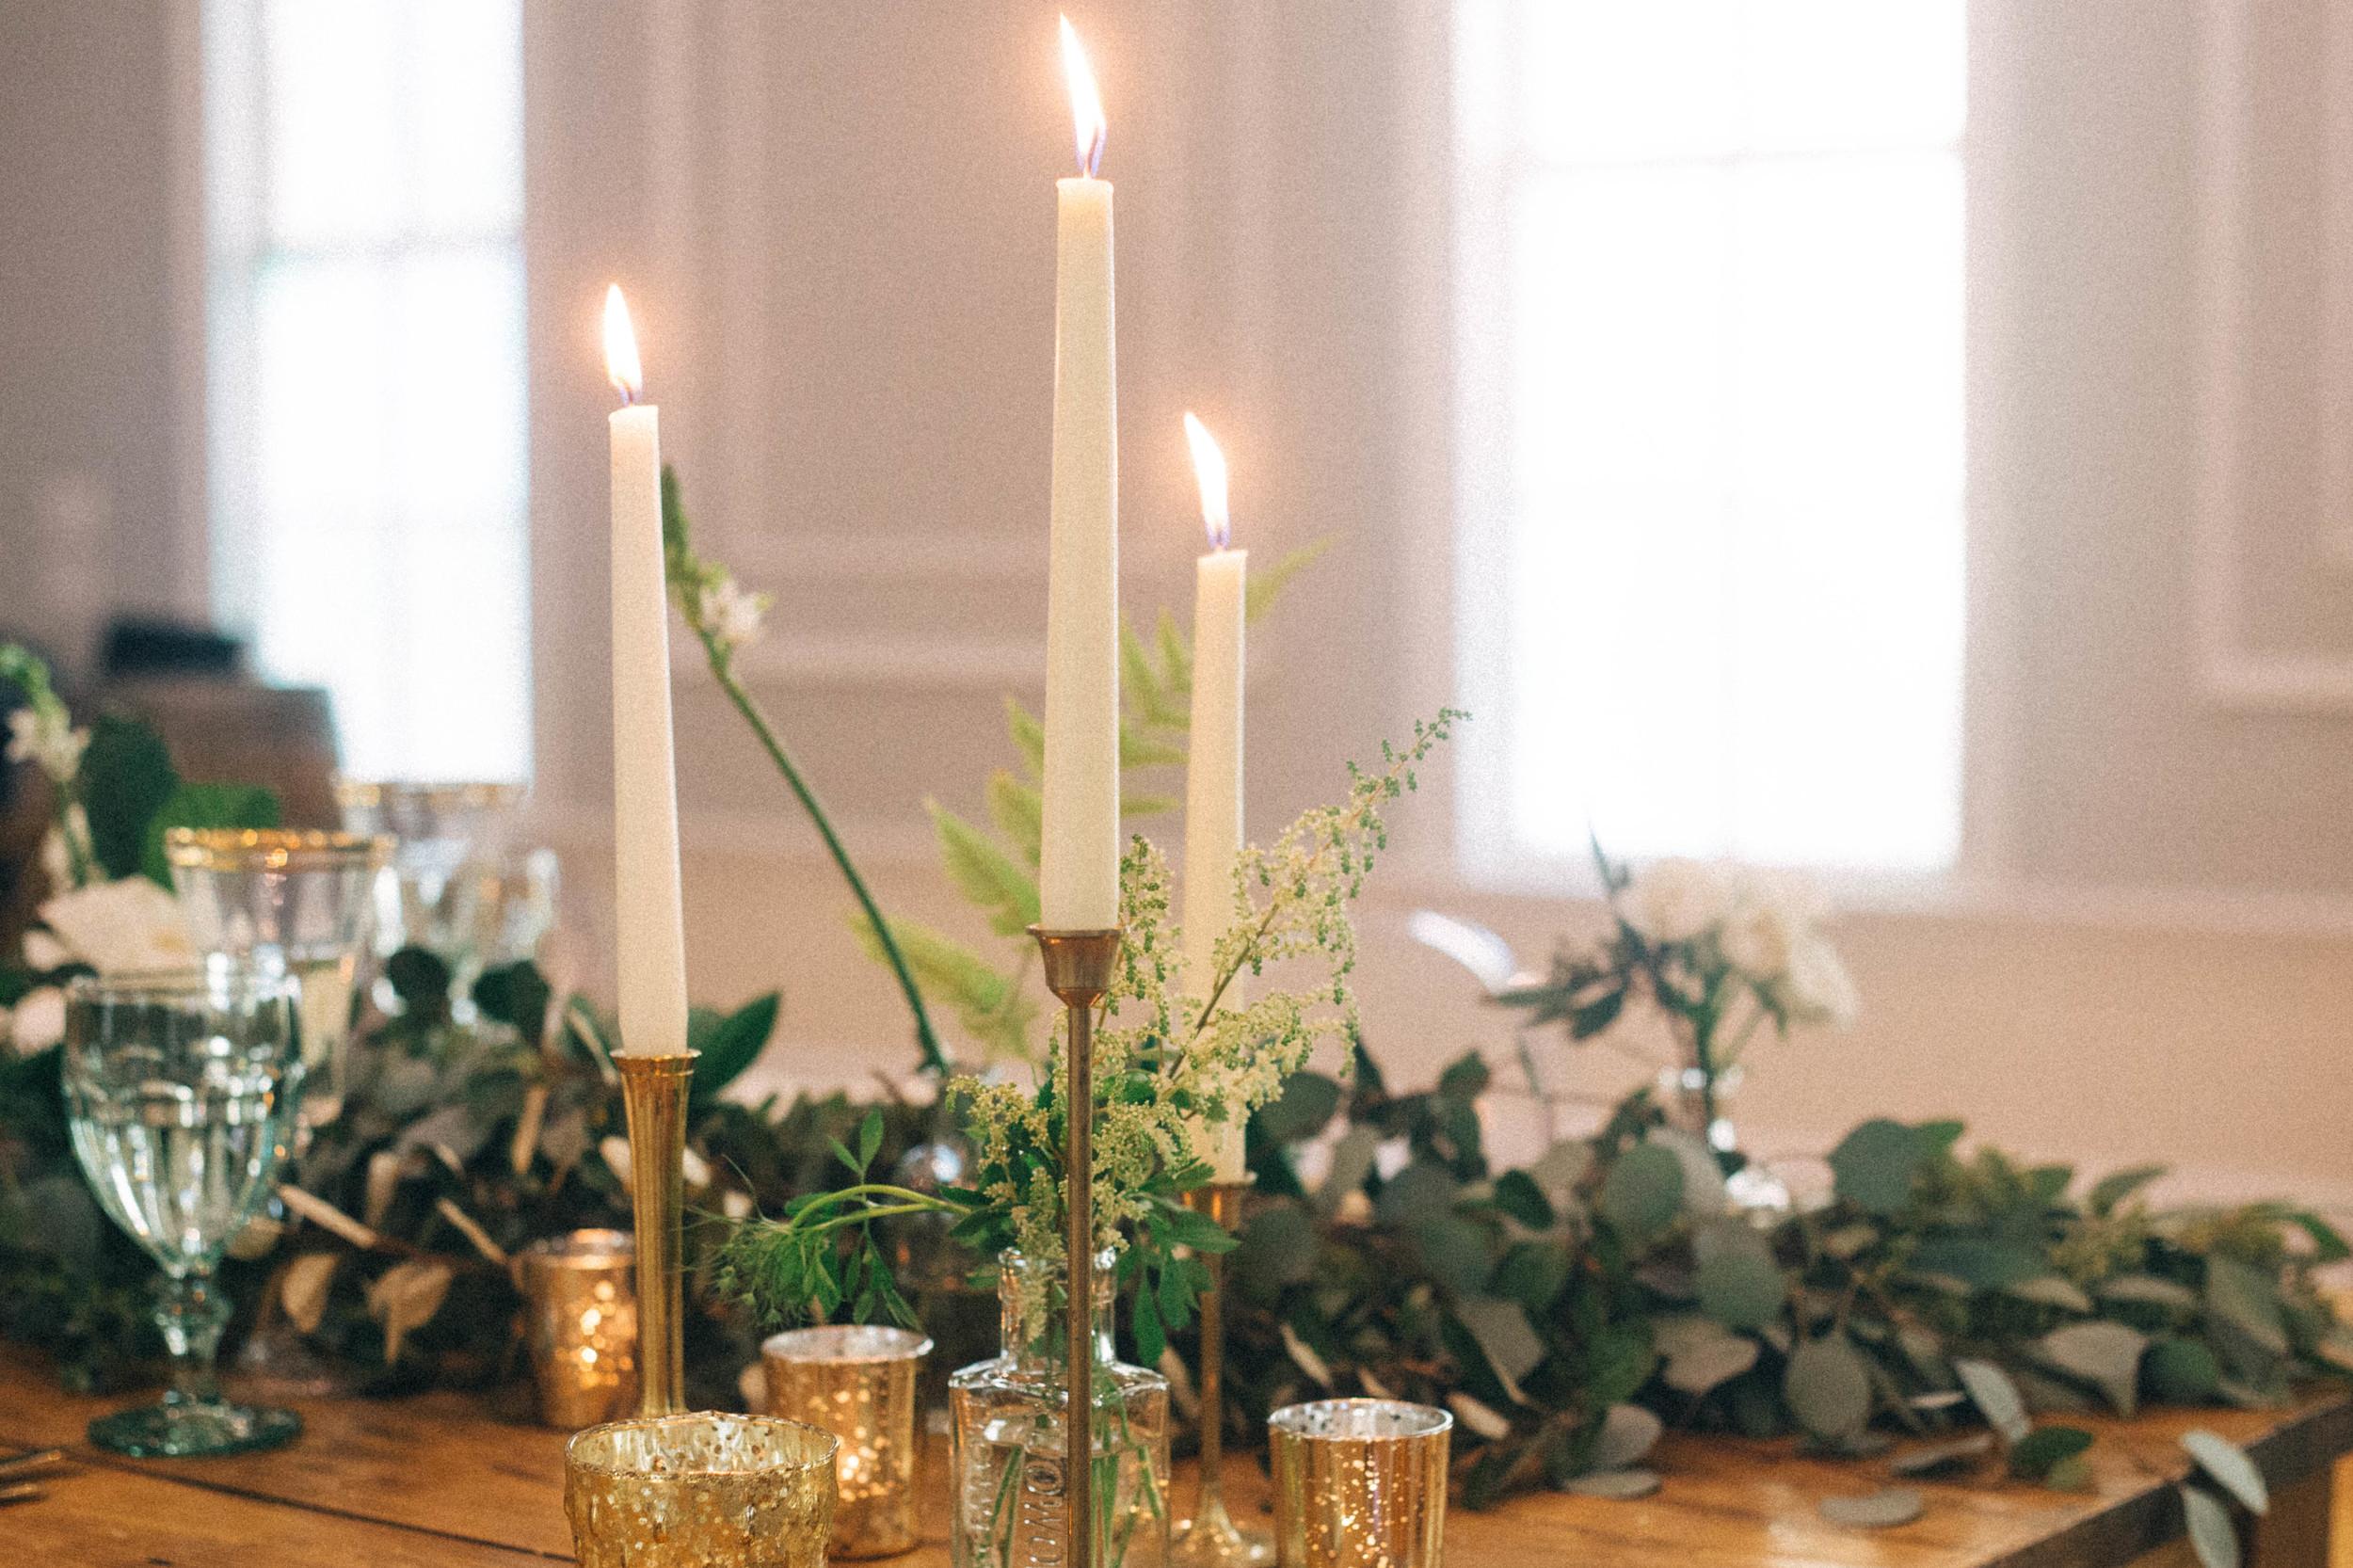 the_parlour_manns_chapel_candles